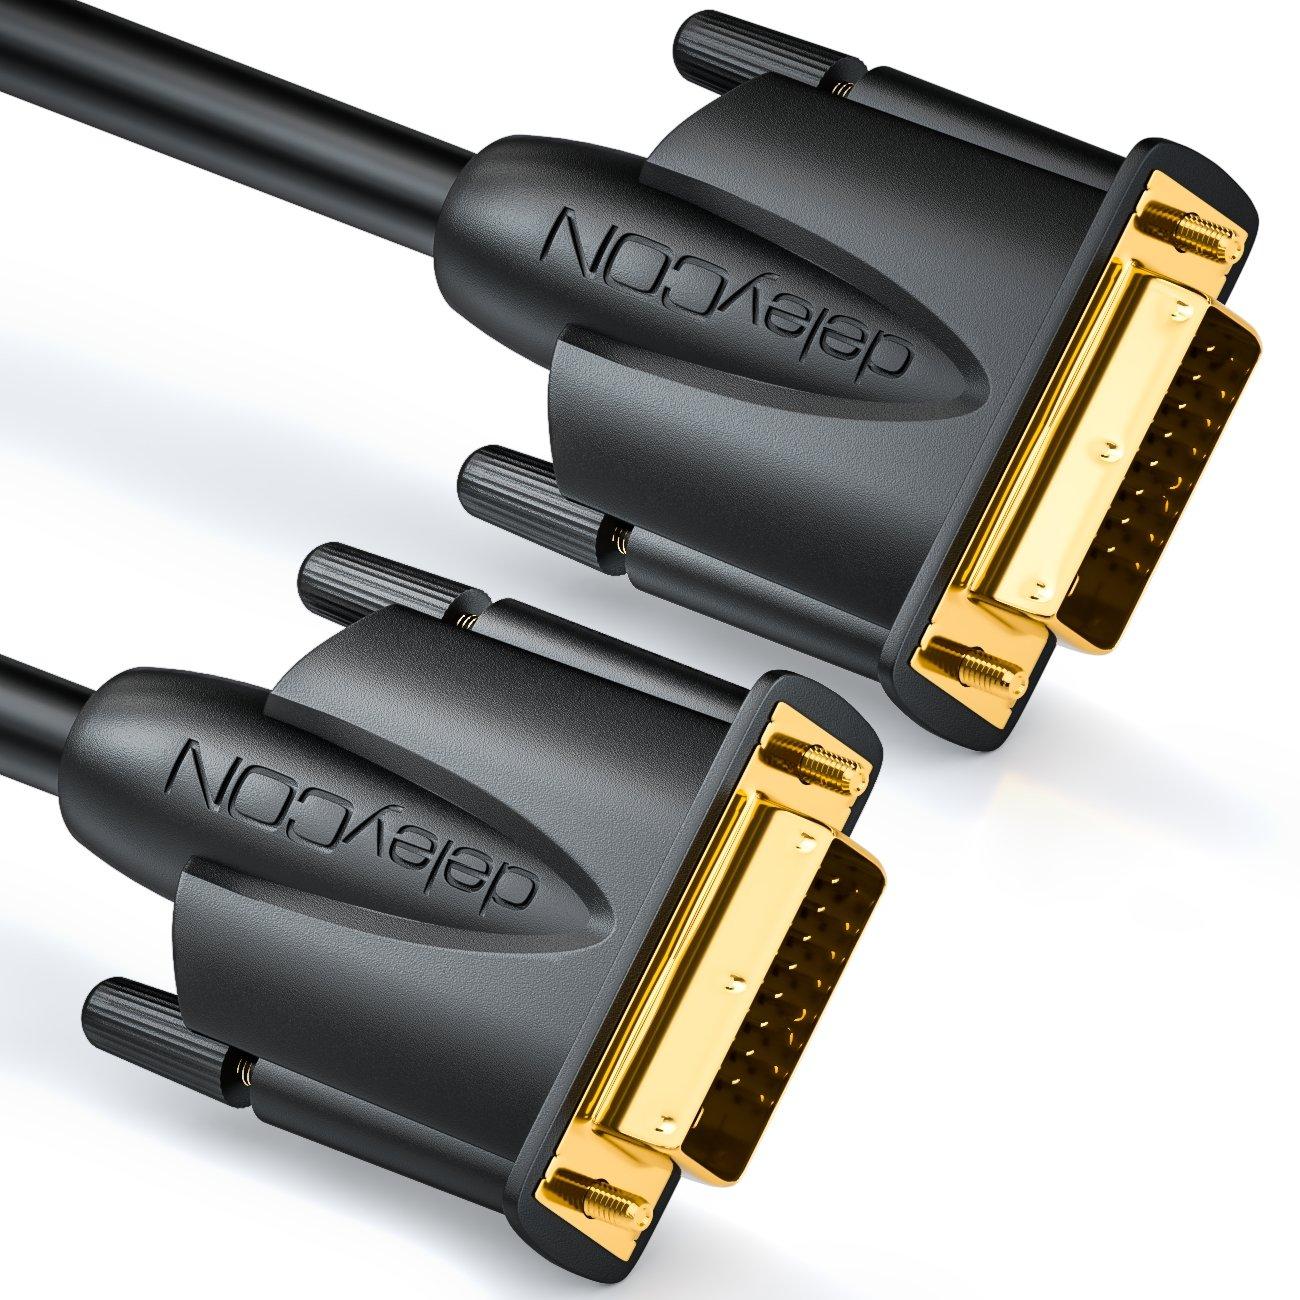 deleyCON C/âble DVI 5m Dual Link 24+1 r/ésolution HDTV jusqu/à 2560x1080 FULL HD 1080p 3D Ready DVI-D Dual Link contacts plaqu/é or Blanc